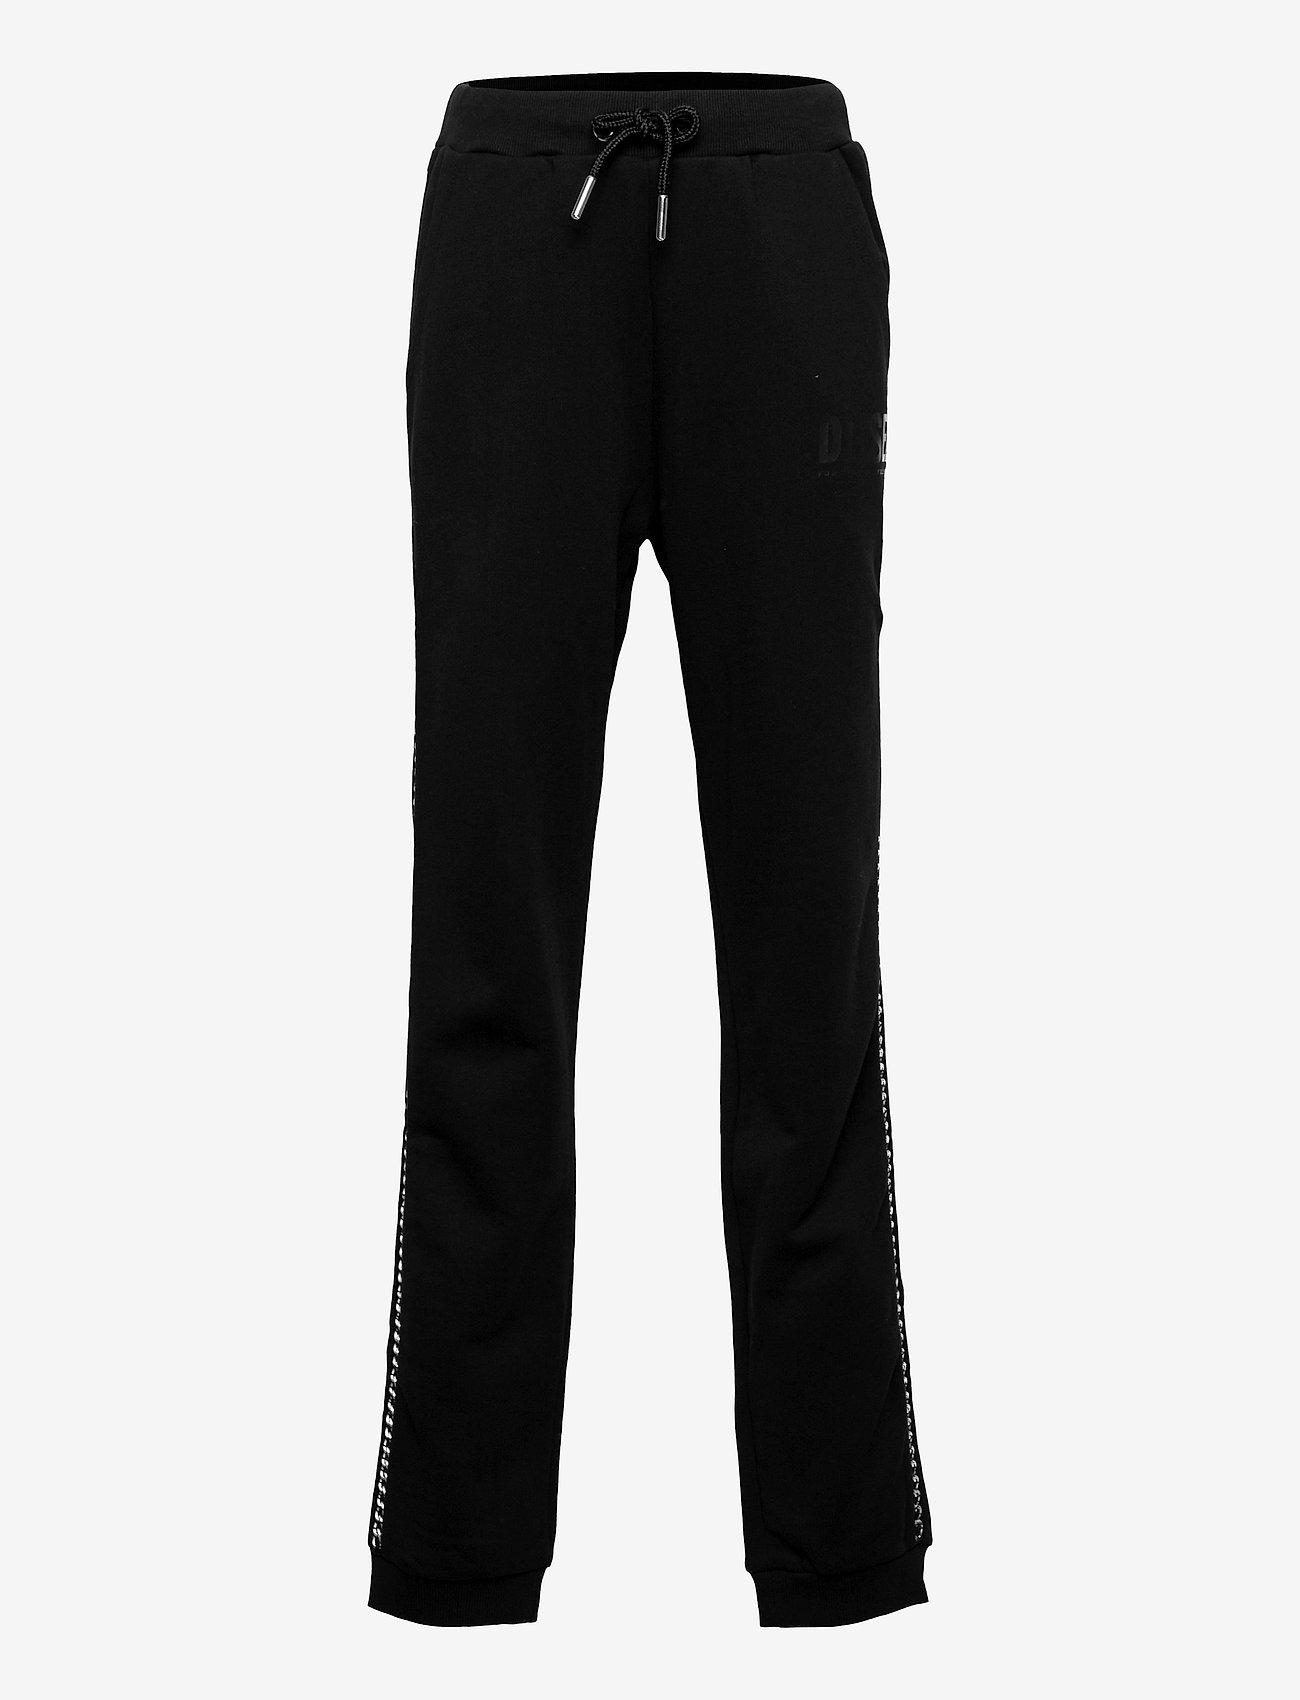 Diesel - PELINA TROUSERS - trousers - nero - 0